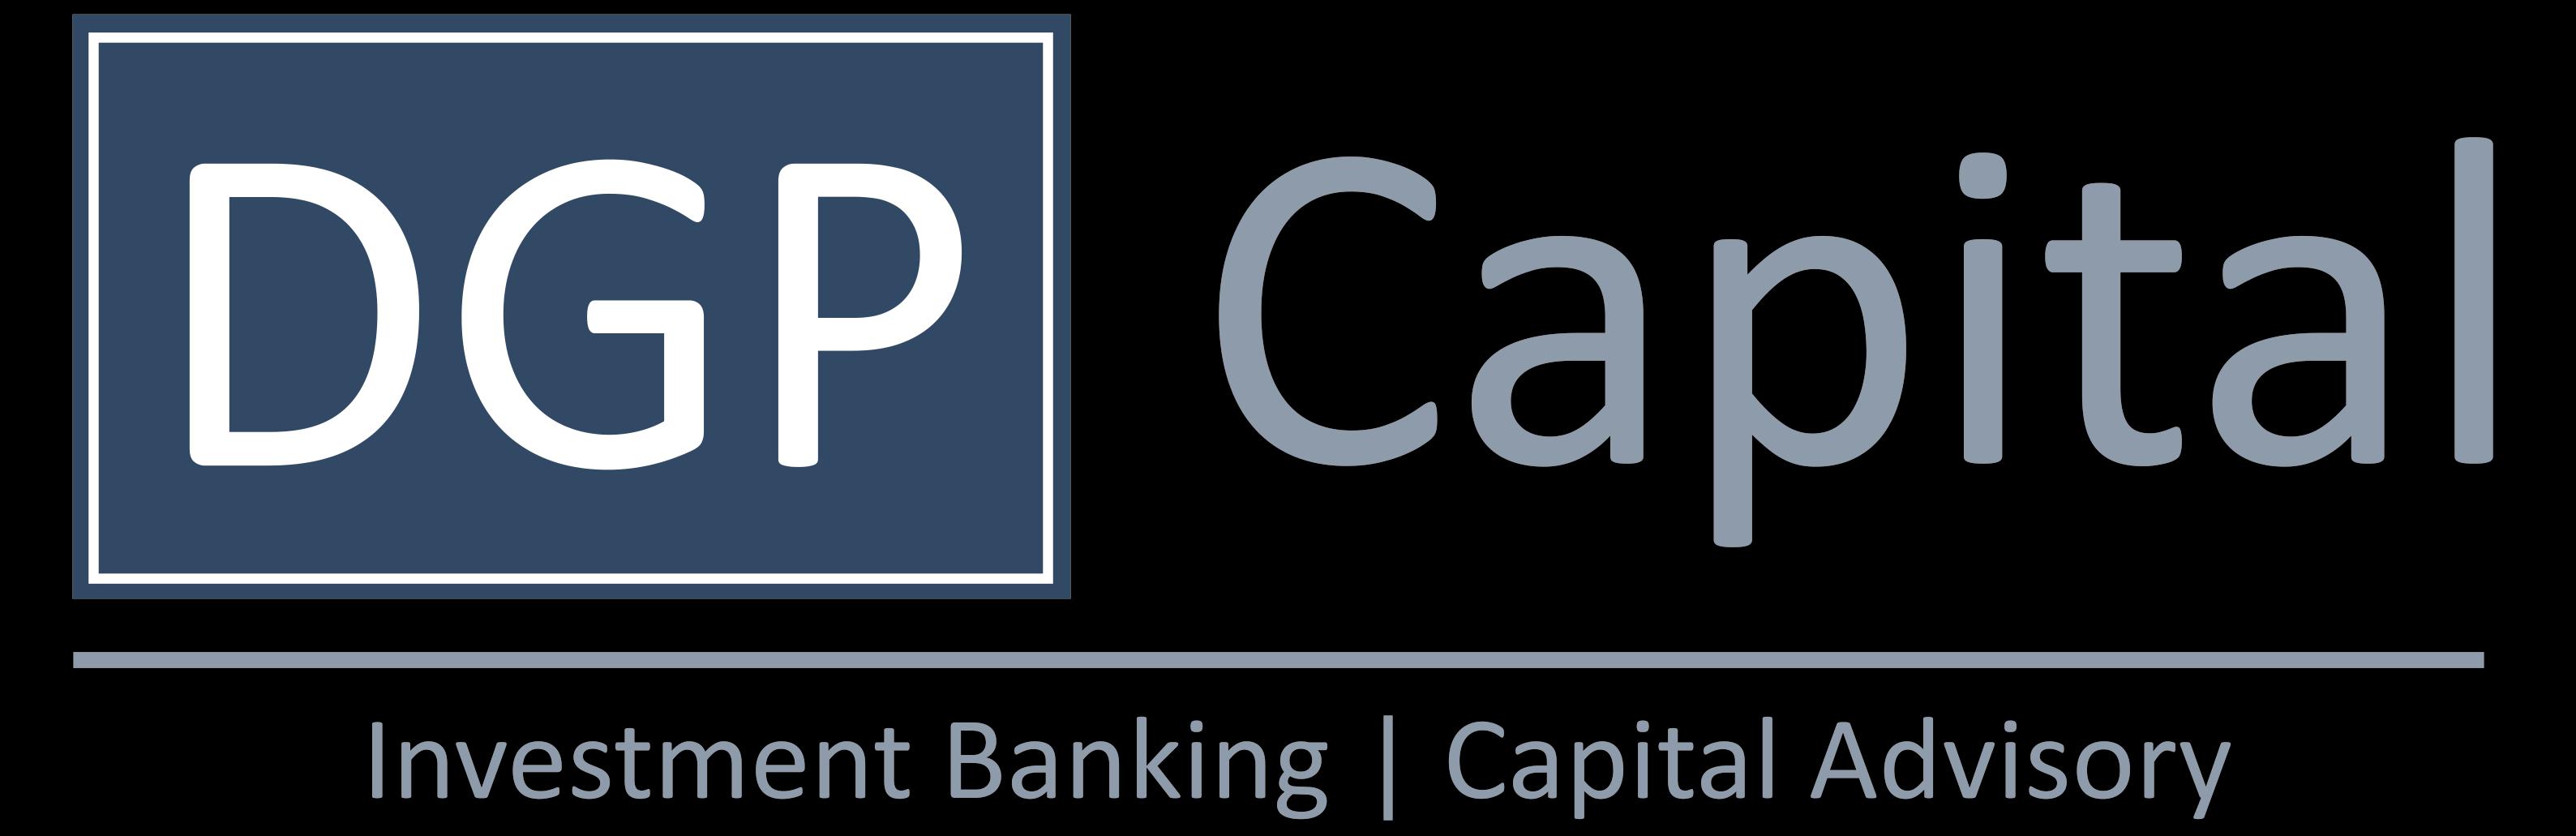 DGP Capital